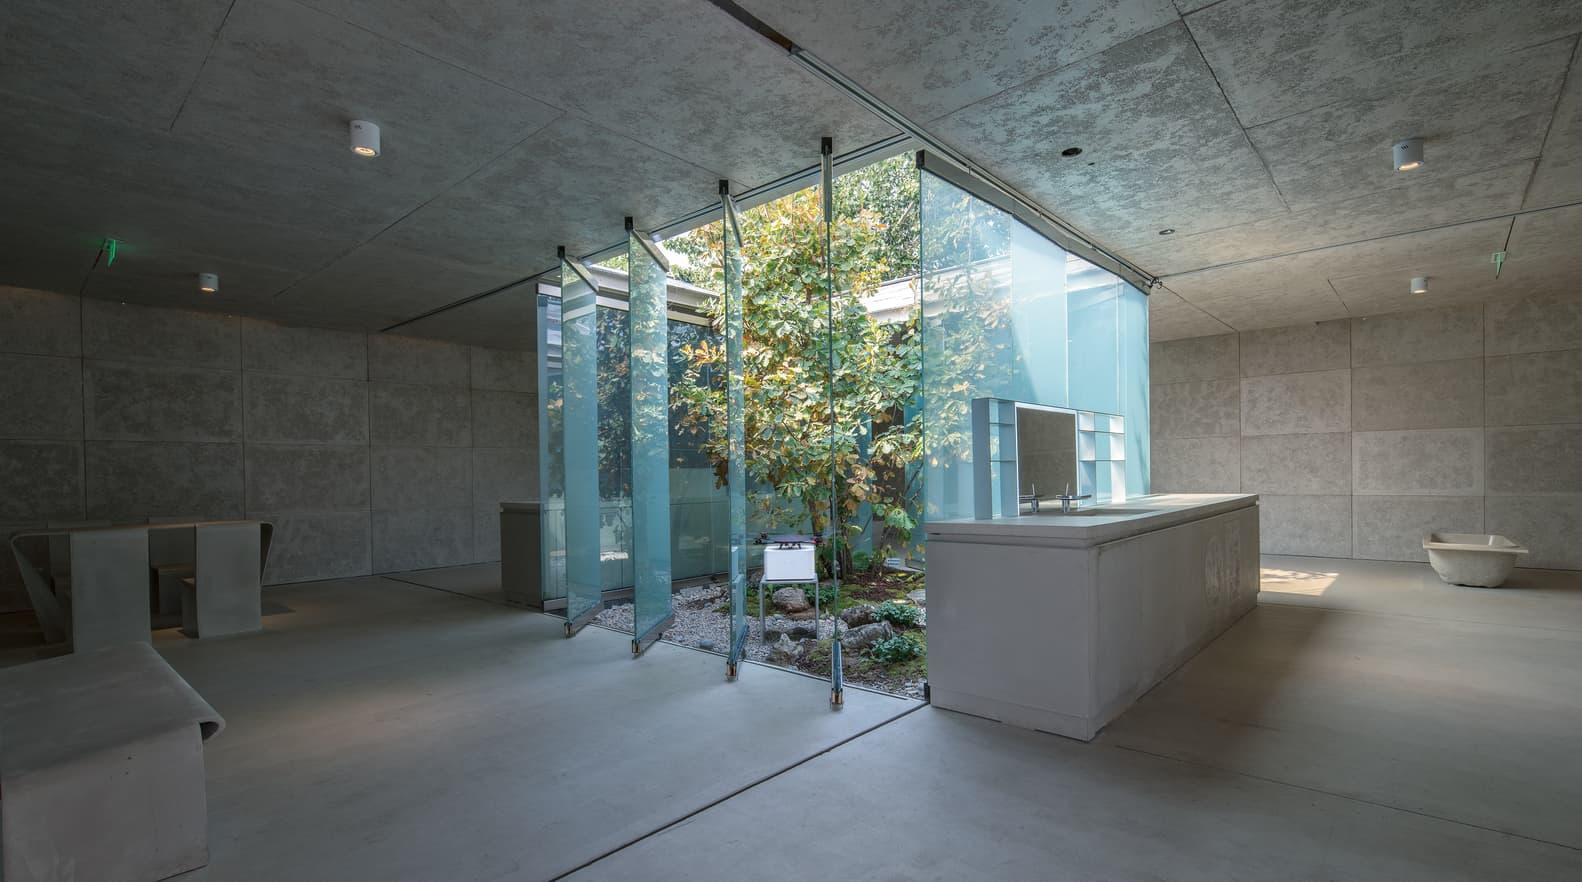 Concrete Vessel vom Atelier FCJZ